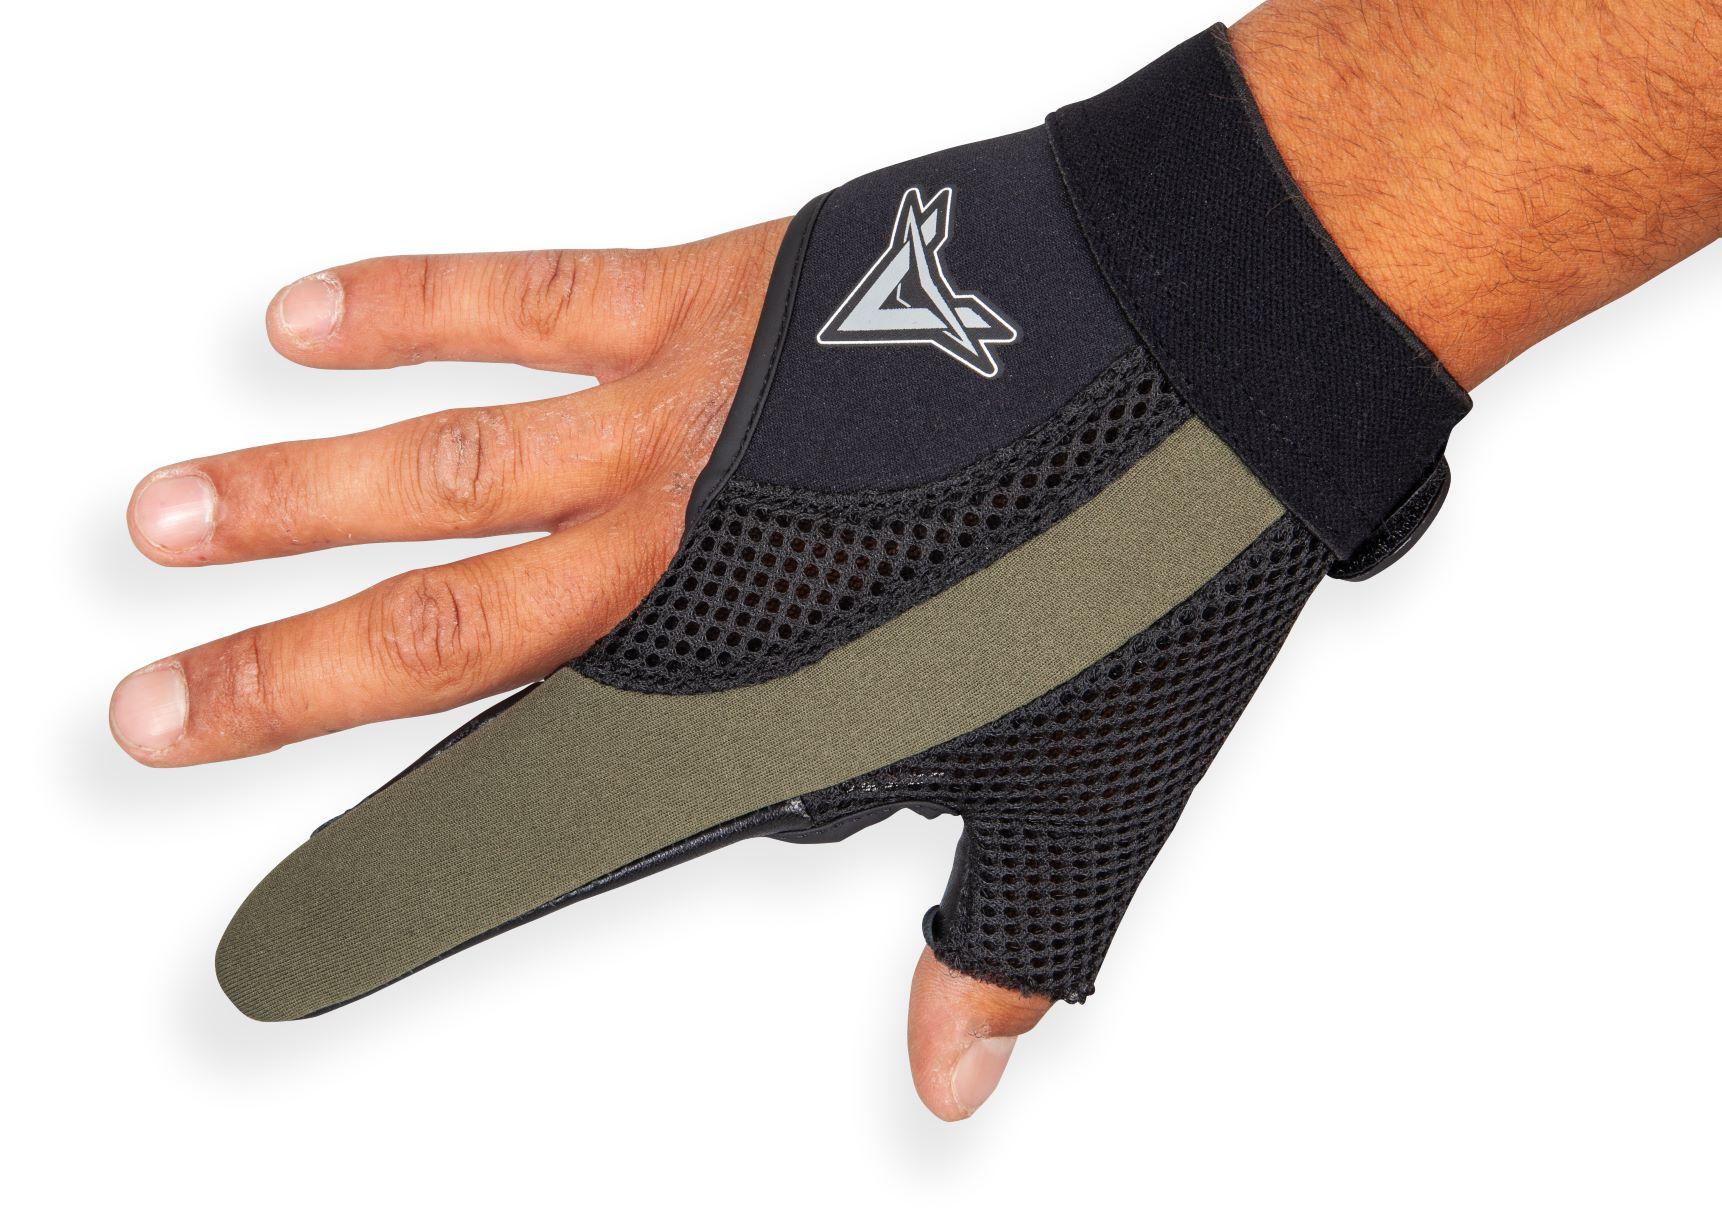 Anaconda rukavice Profi Casting Glove, pravá, vel. XXL